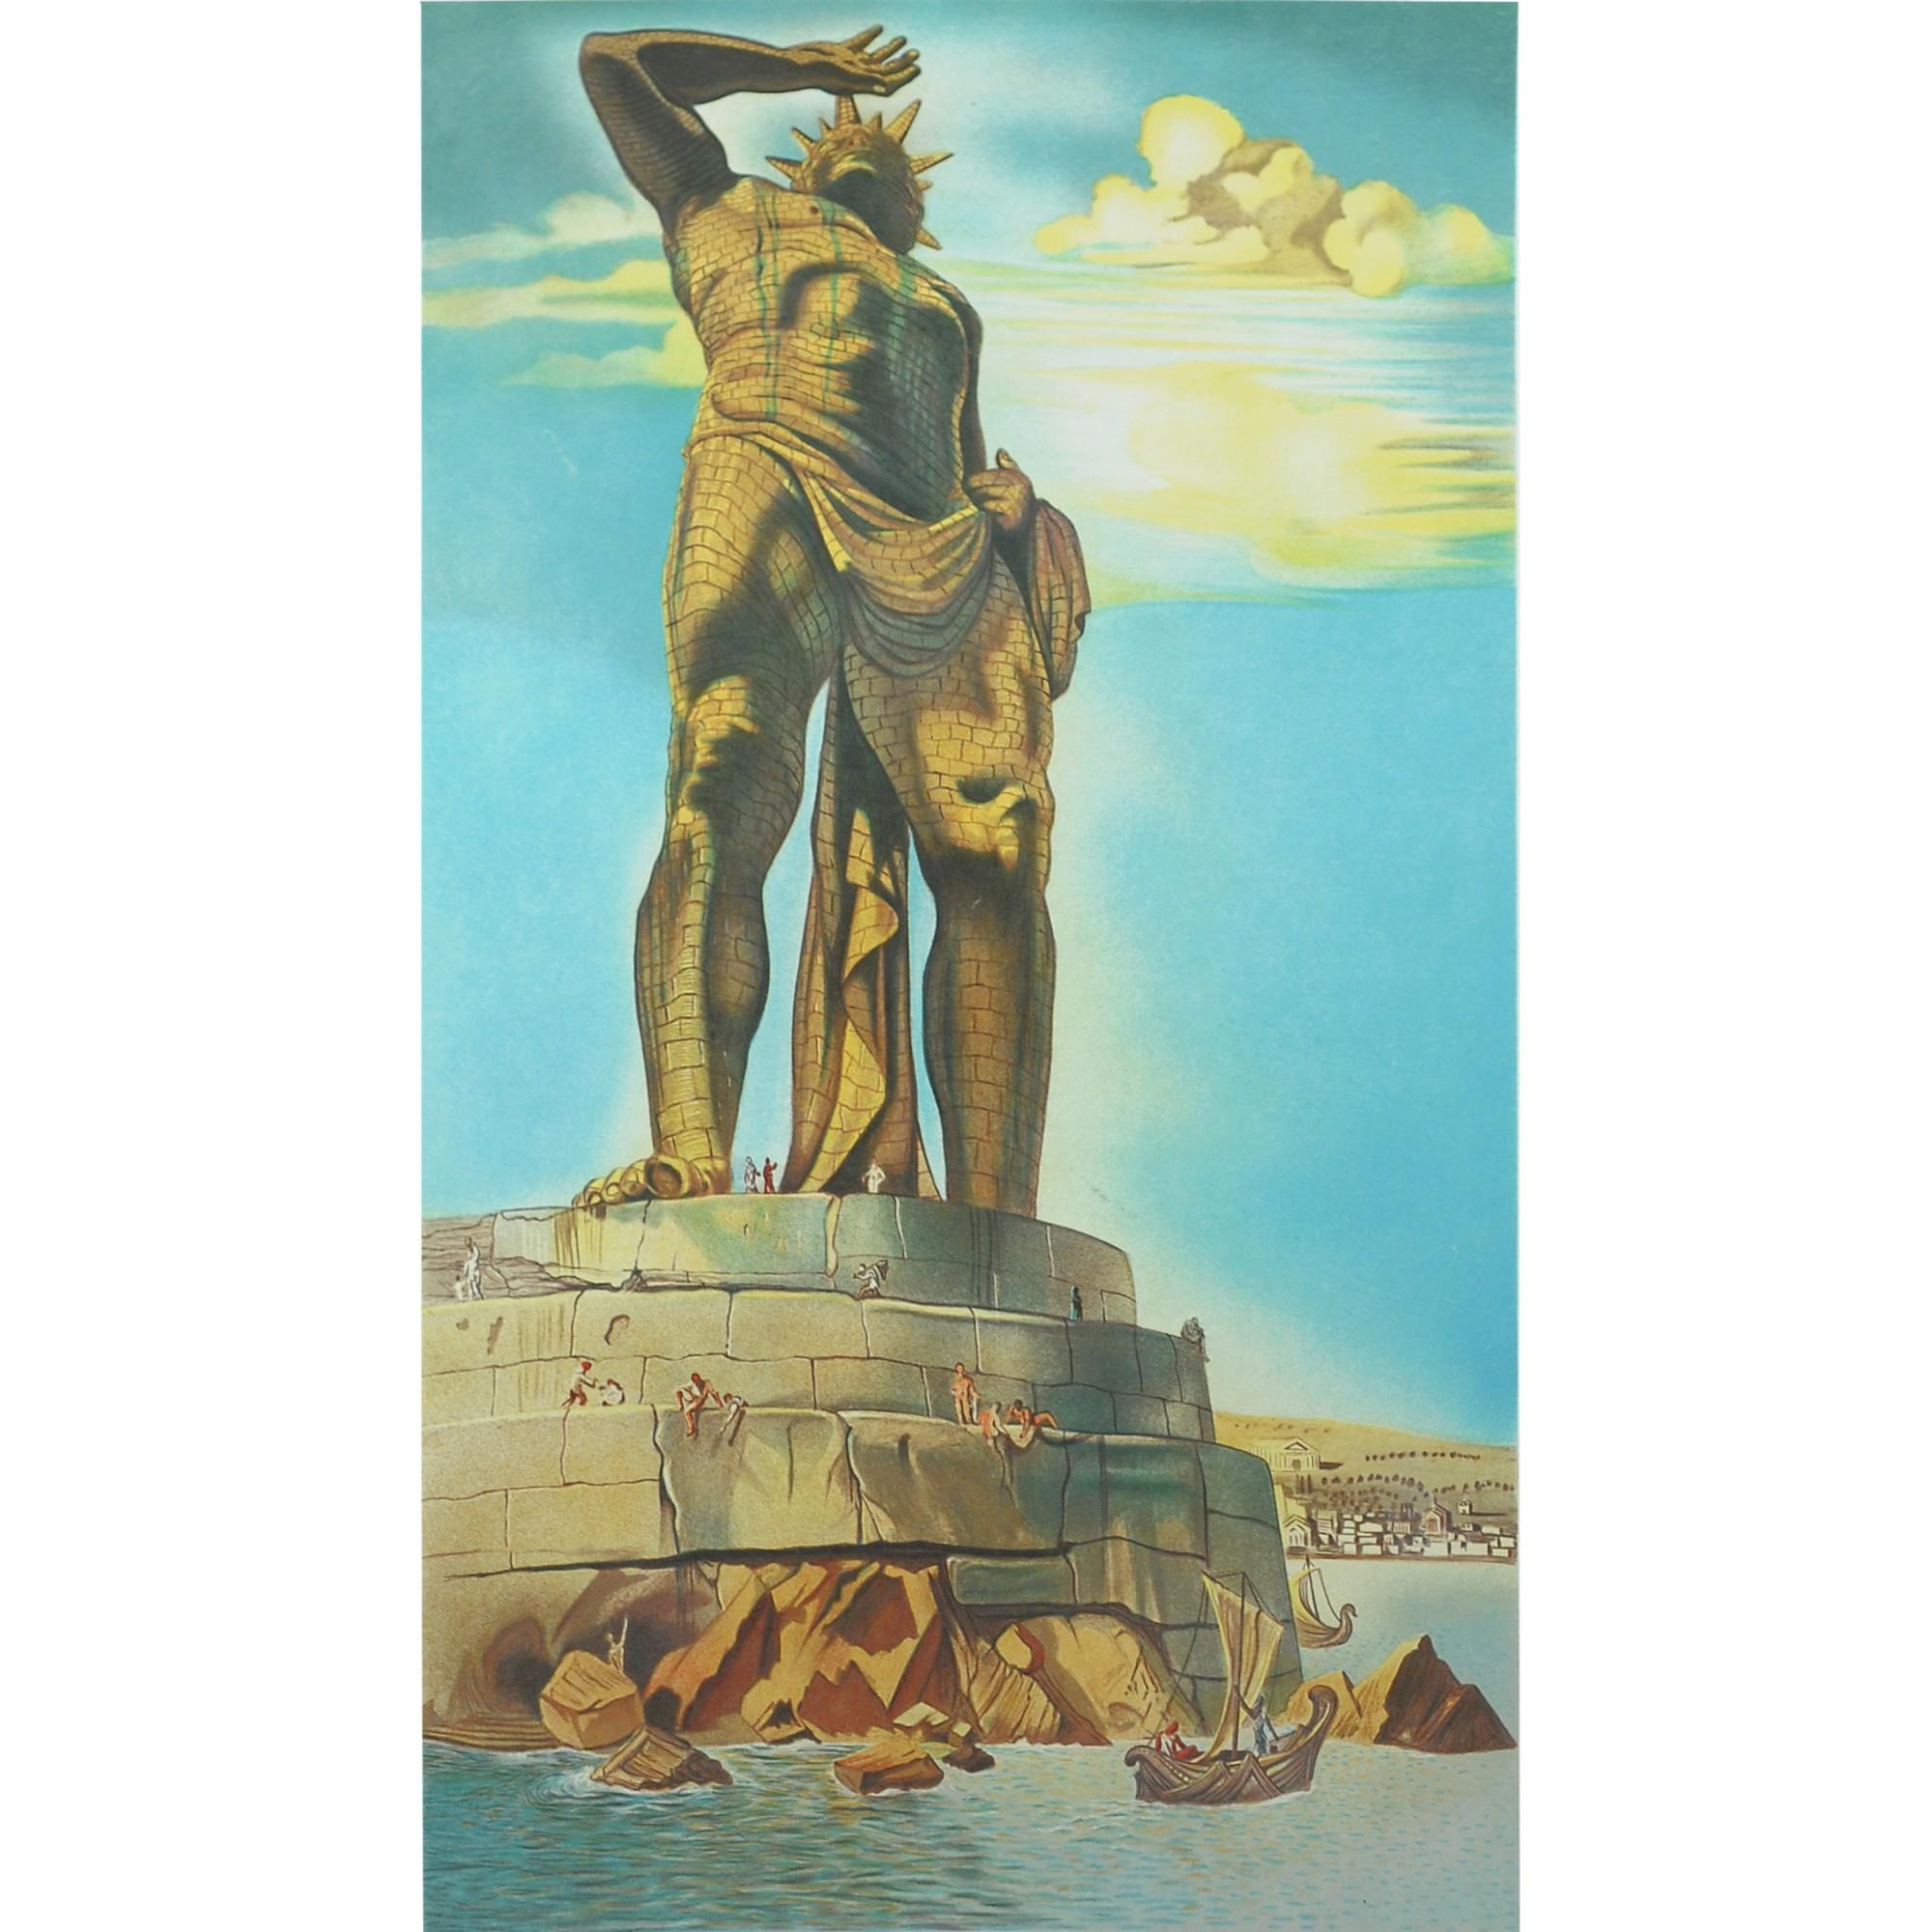 nolisoli bid gavel and block salcedo auction salvador-dali-colossus_of_rhodes_1